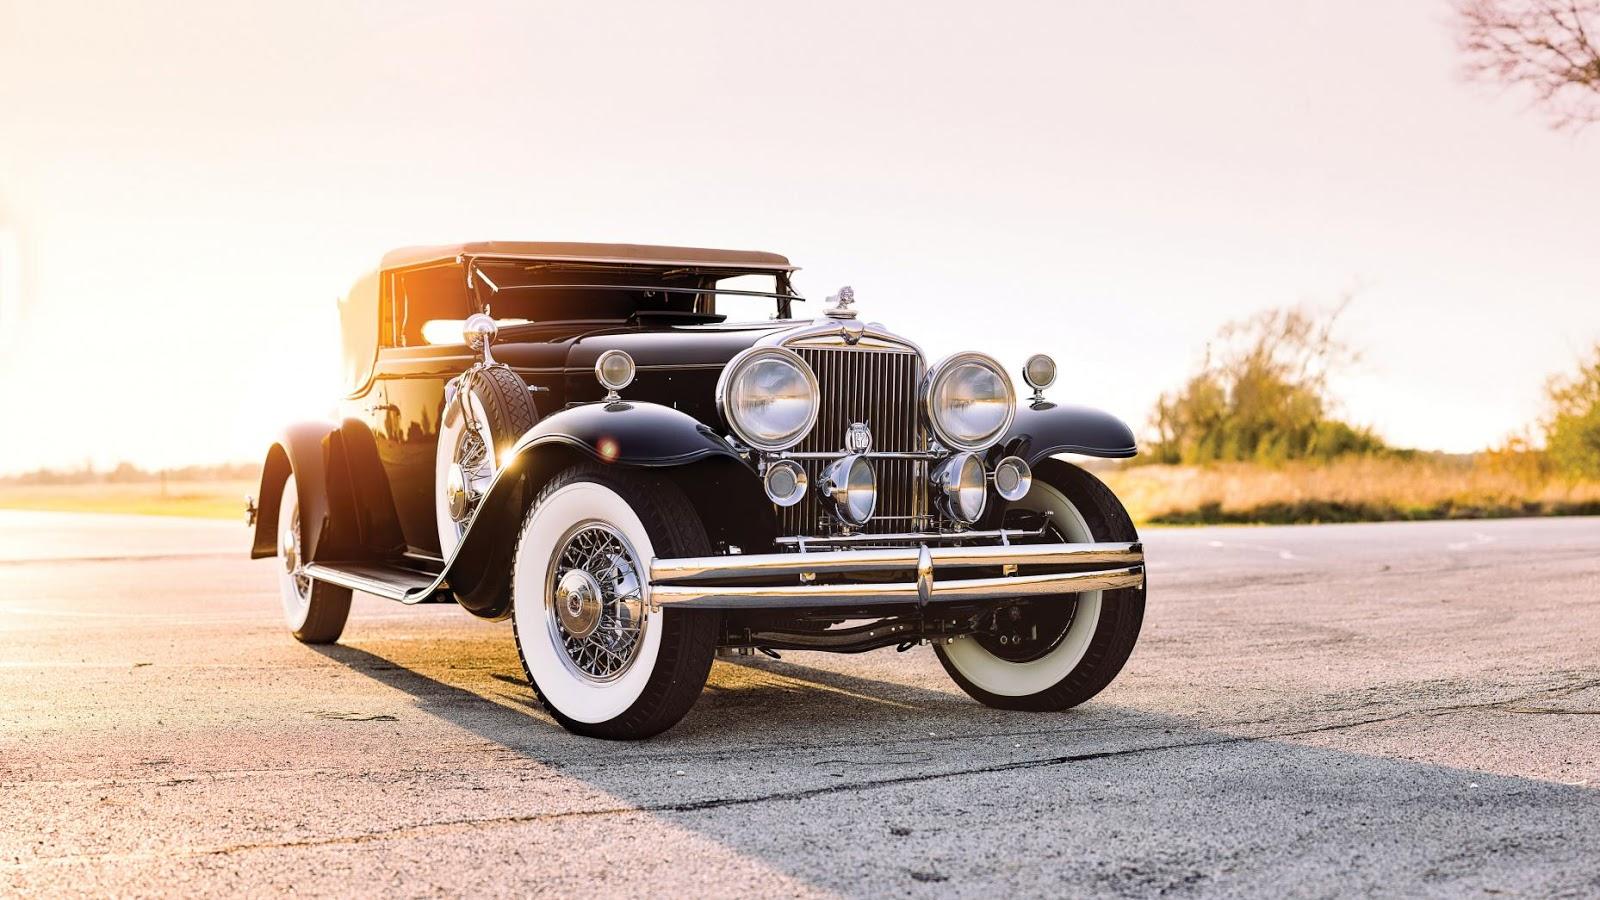 1931 Stutz DV-32 Convertible Victoria: $1,100,000